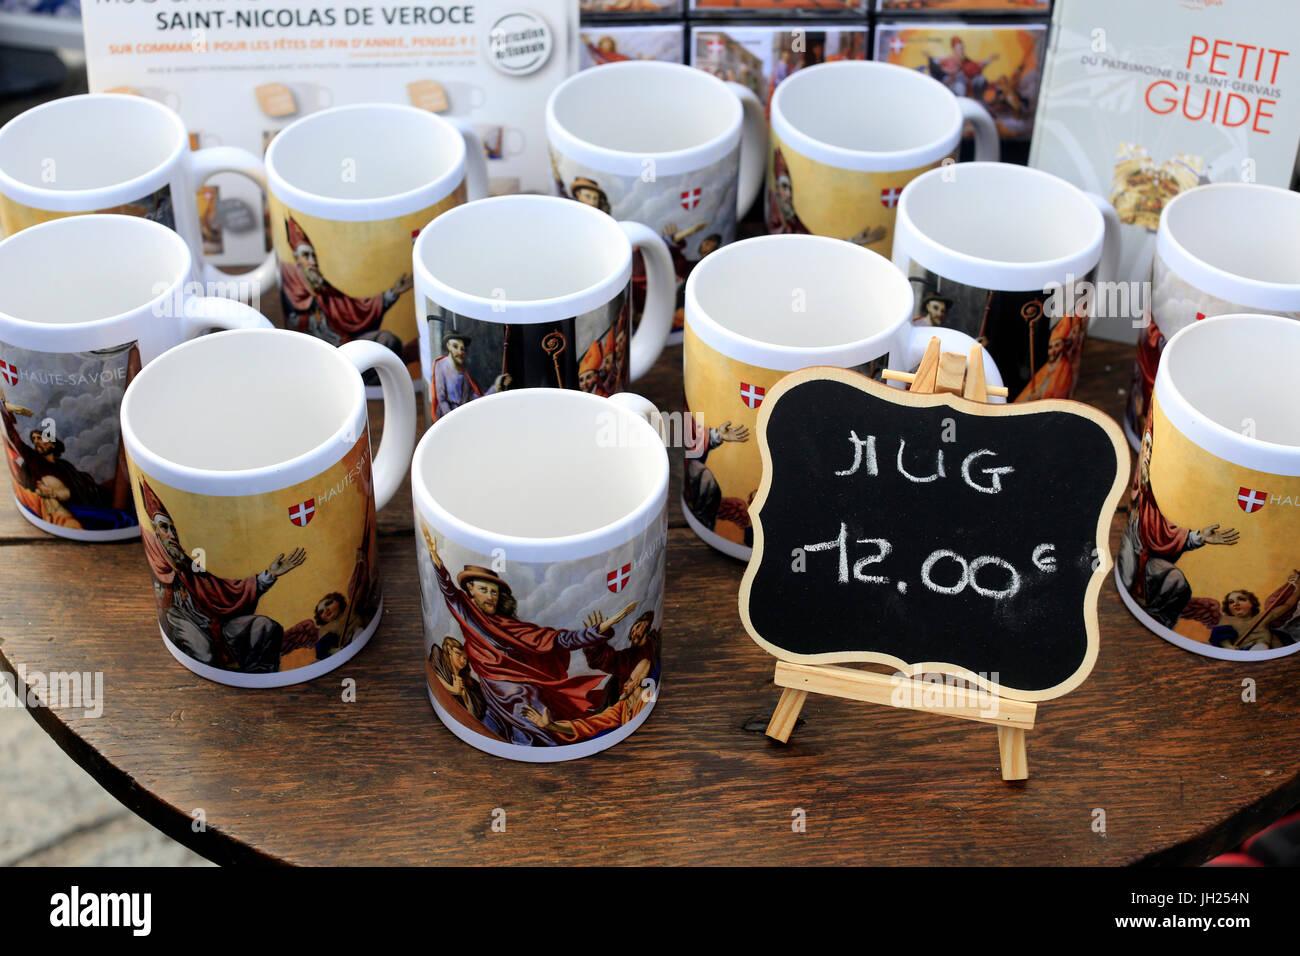 Mugs for sale on market.  France. - Stock Image